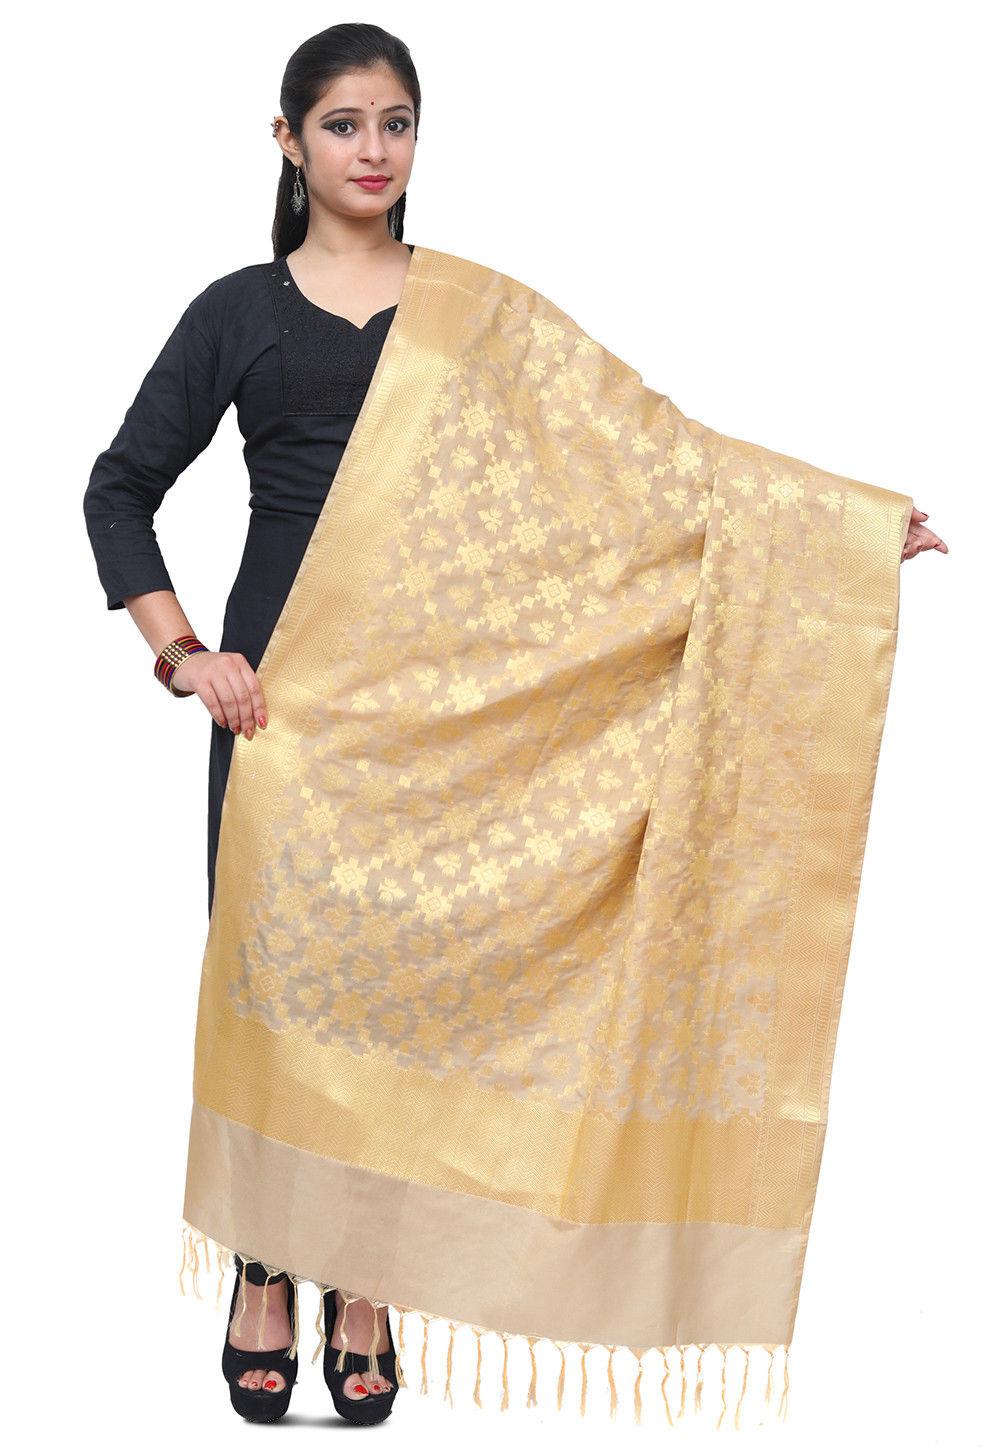 Banarasi Silk Dupatta in Light Beige